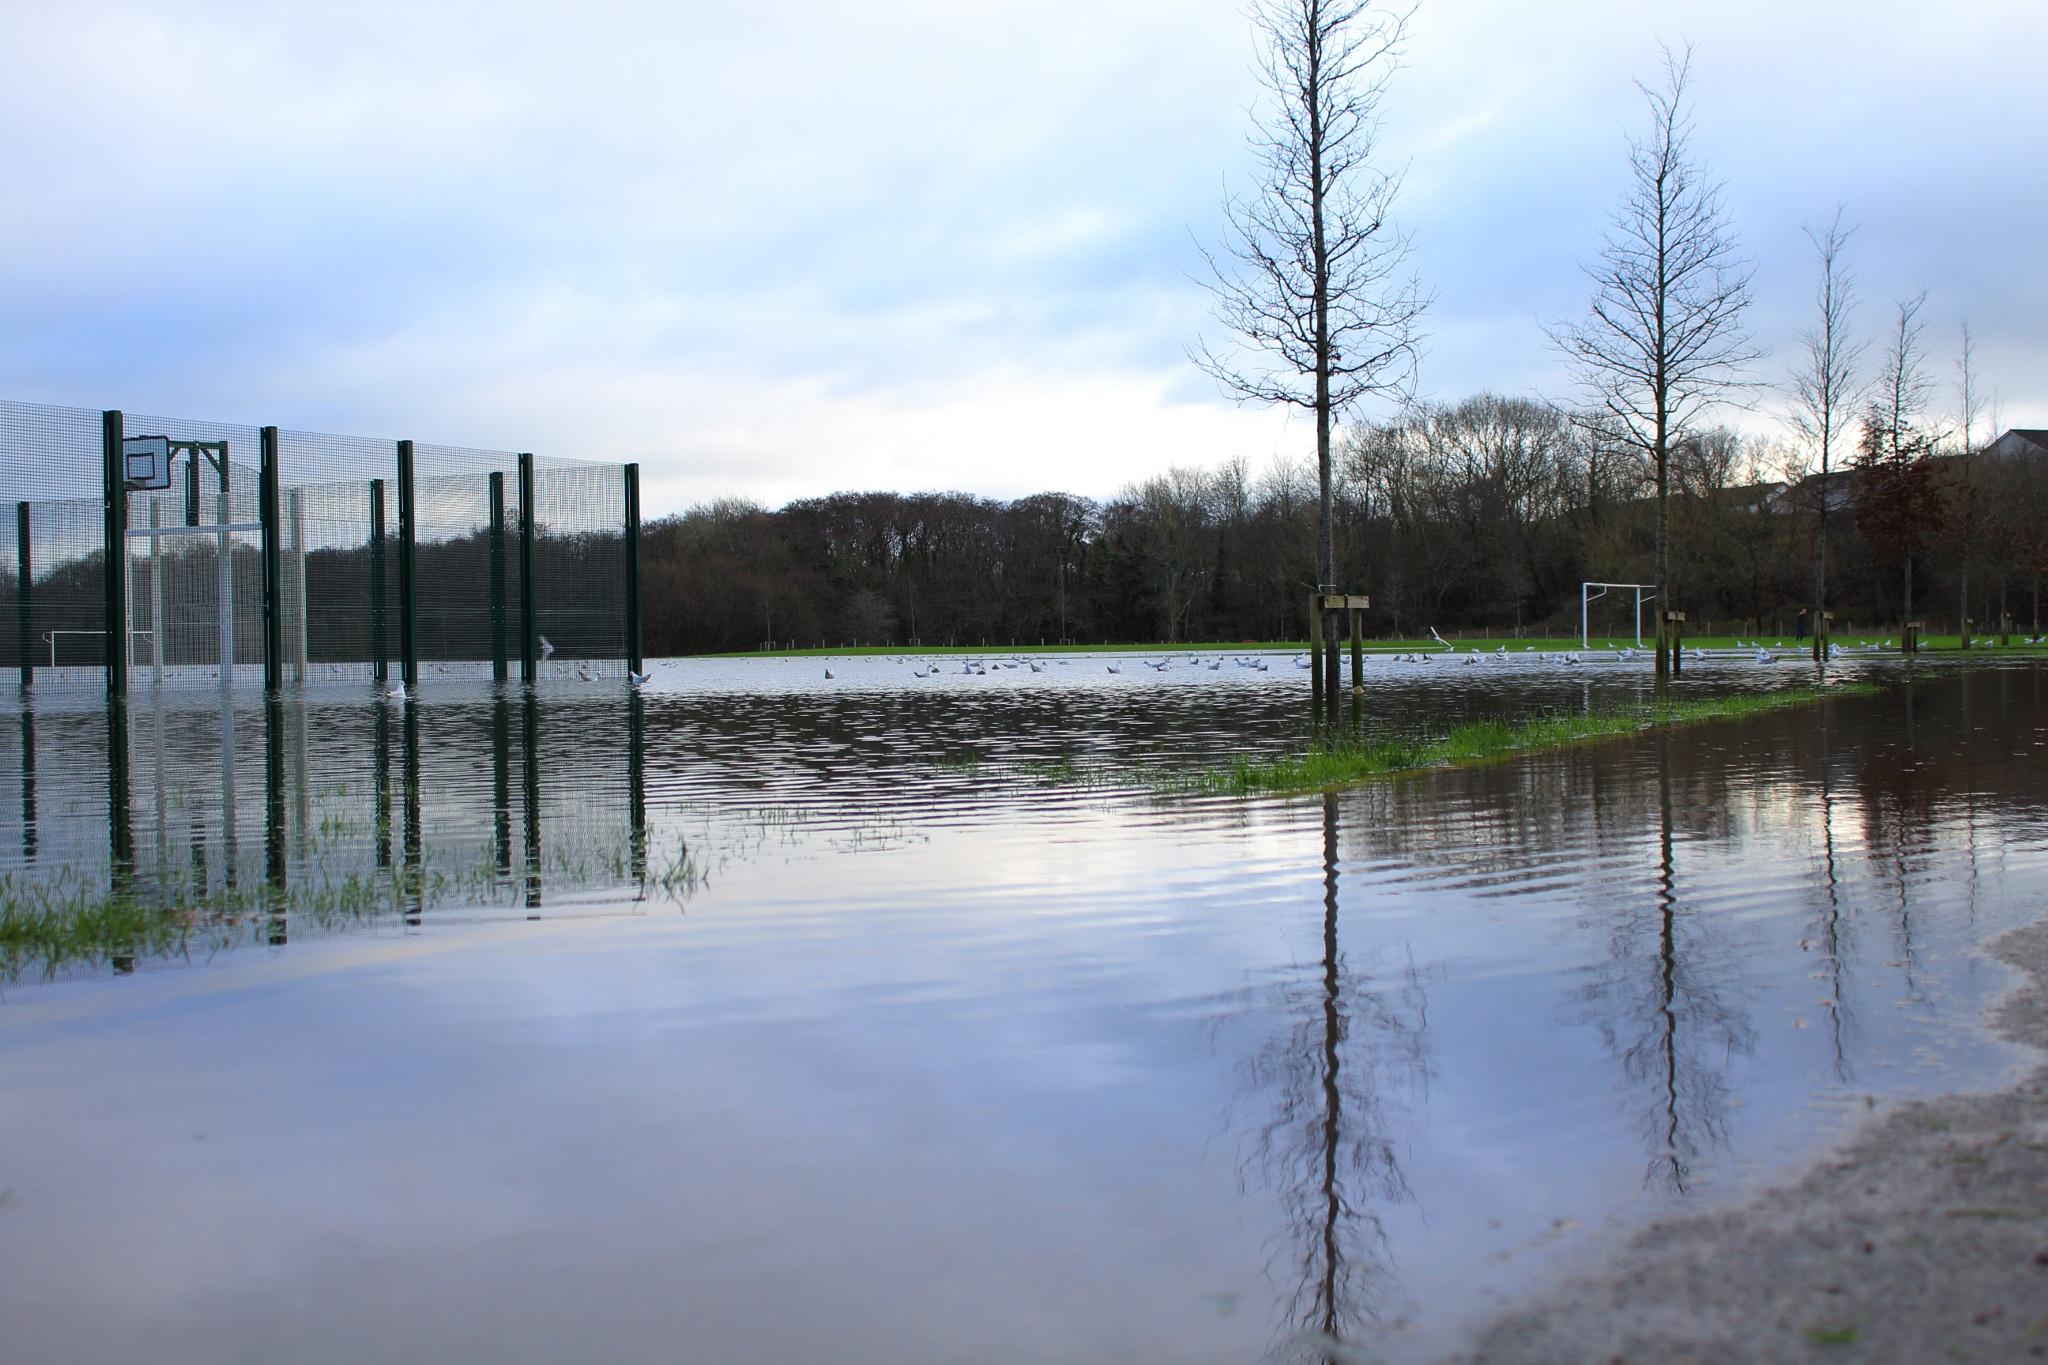 Flooded  by Loreta Tavoraite